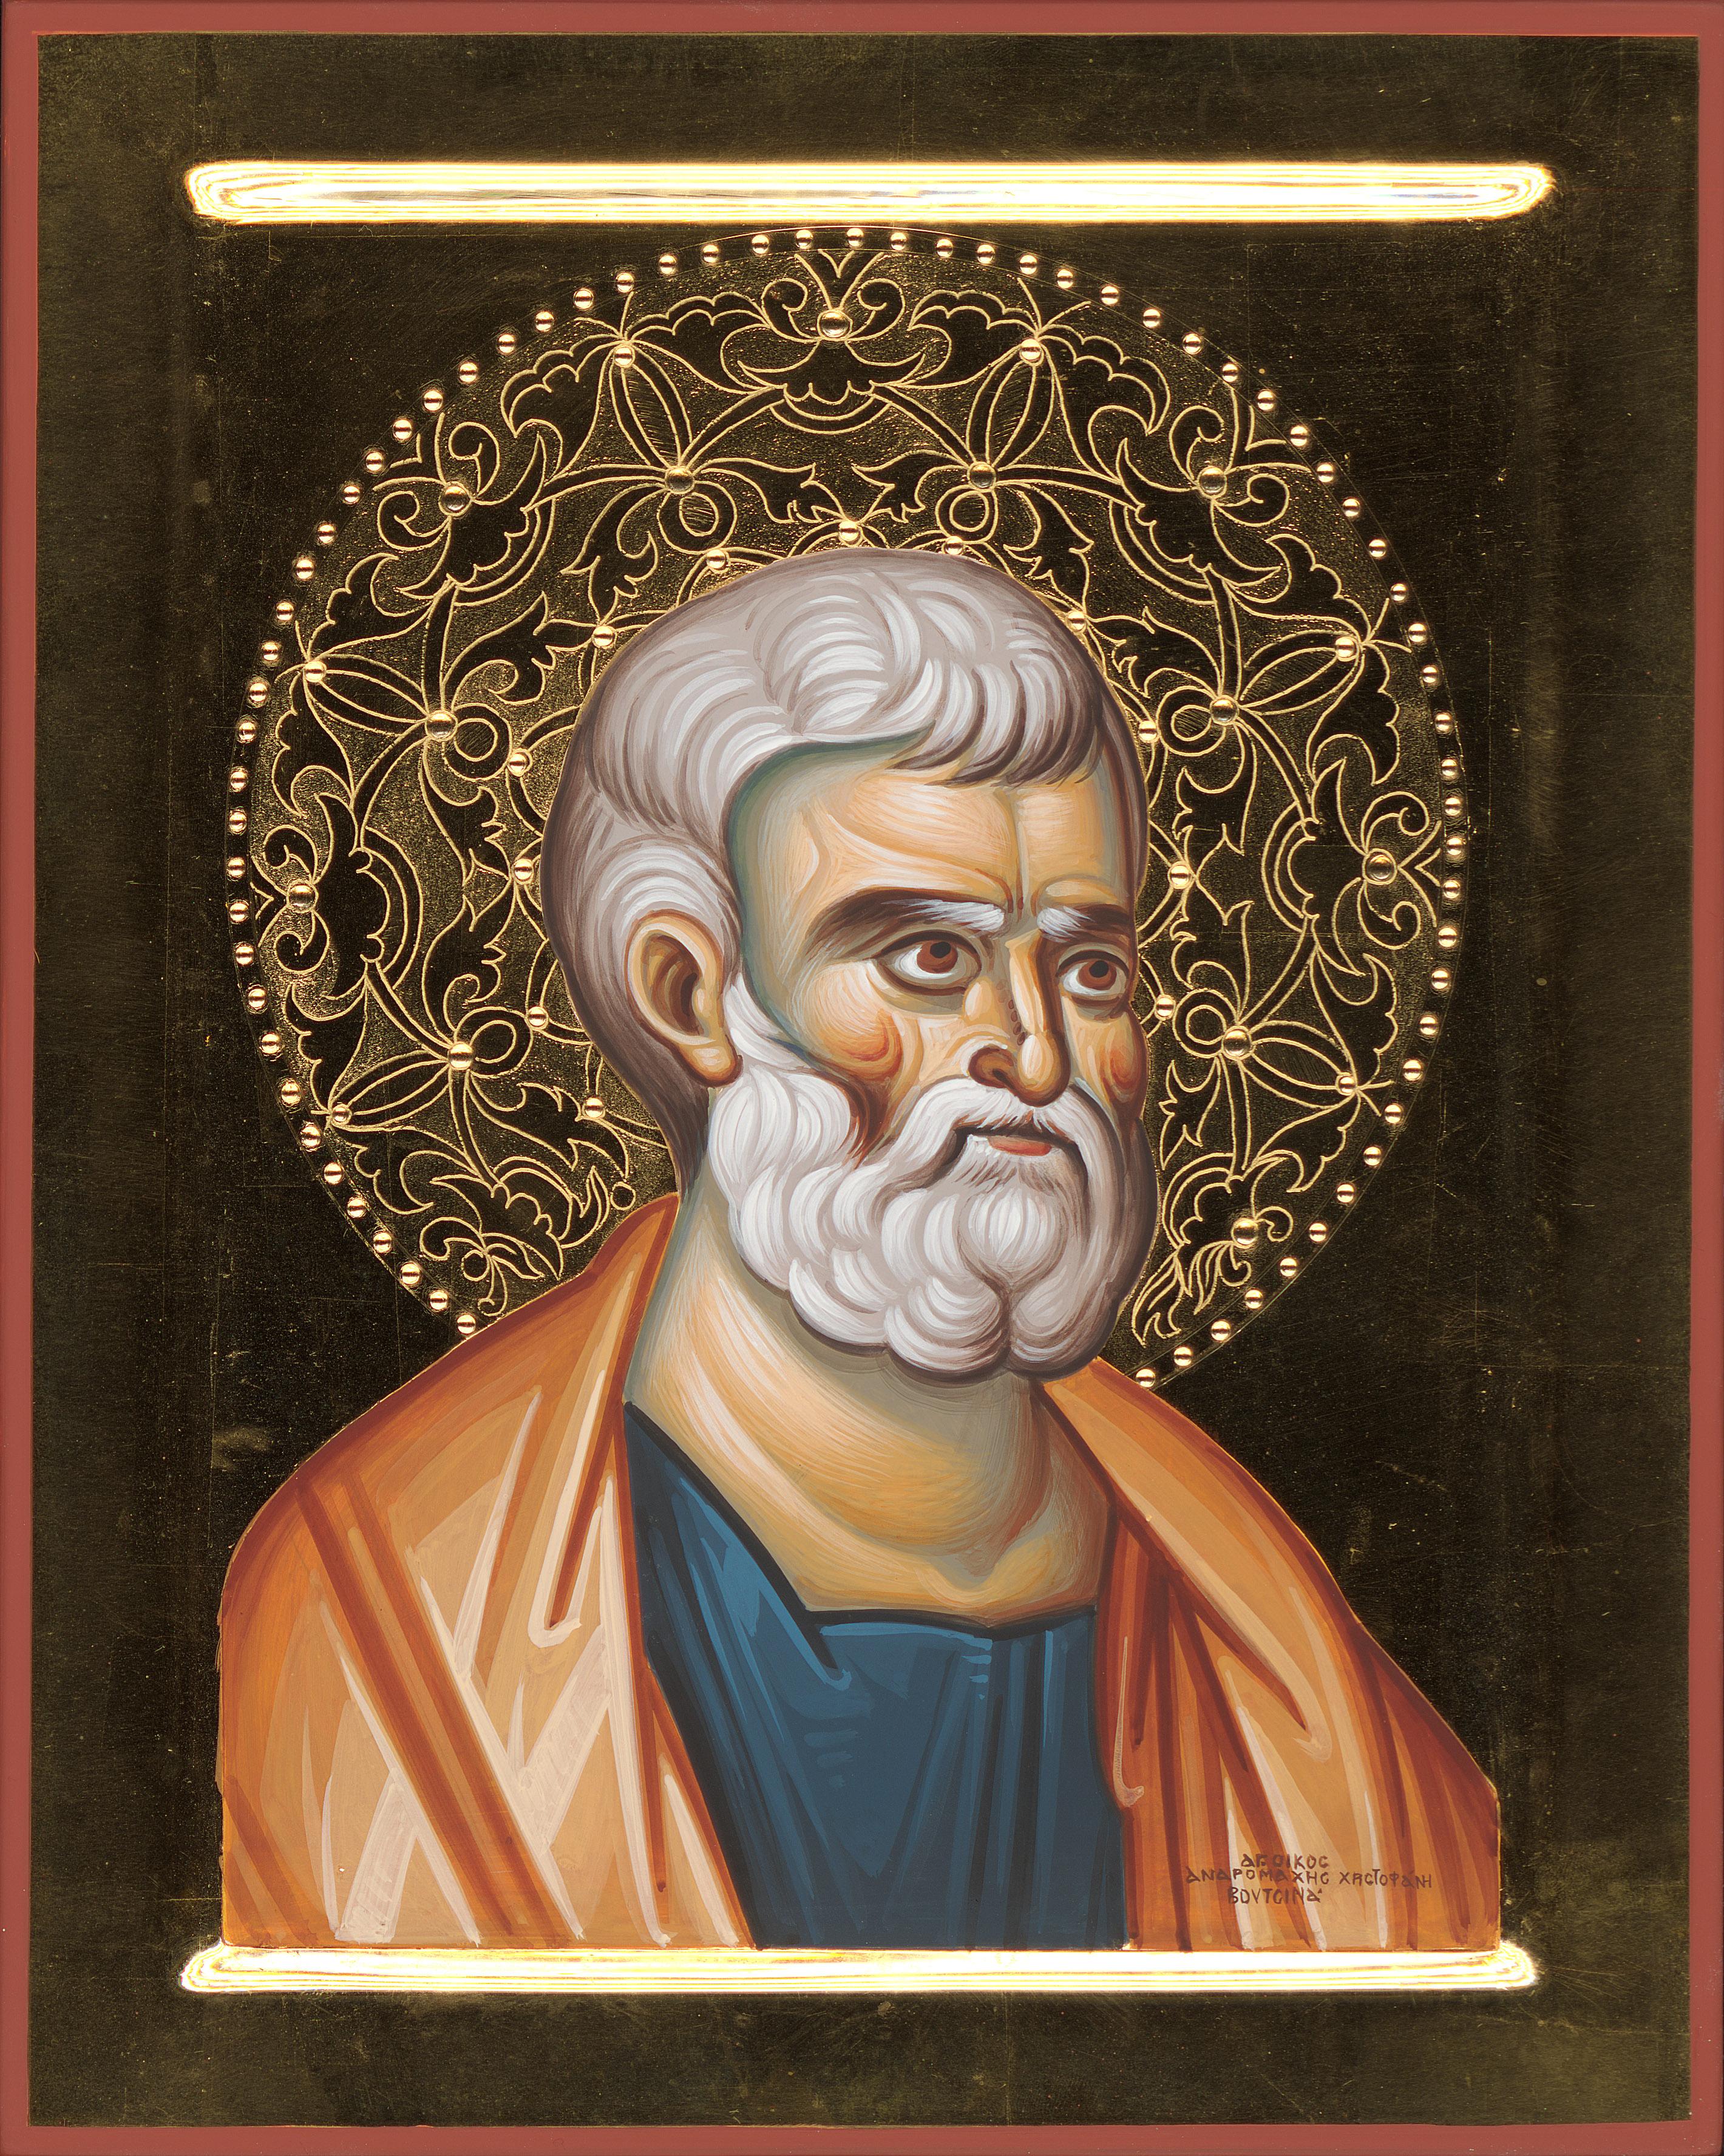 Andromachi Voutsina (Greek), Saint Peter the Apostle,, Tempera, 30 x 24 cm